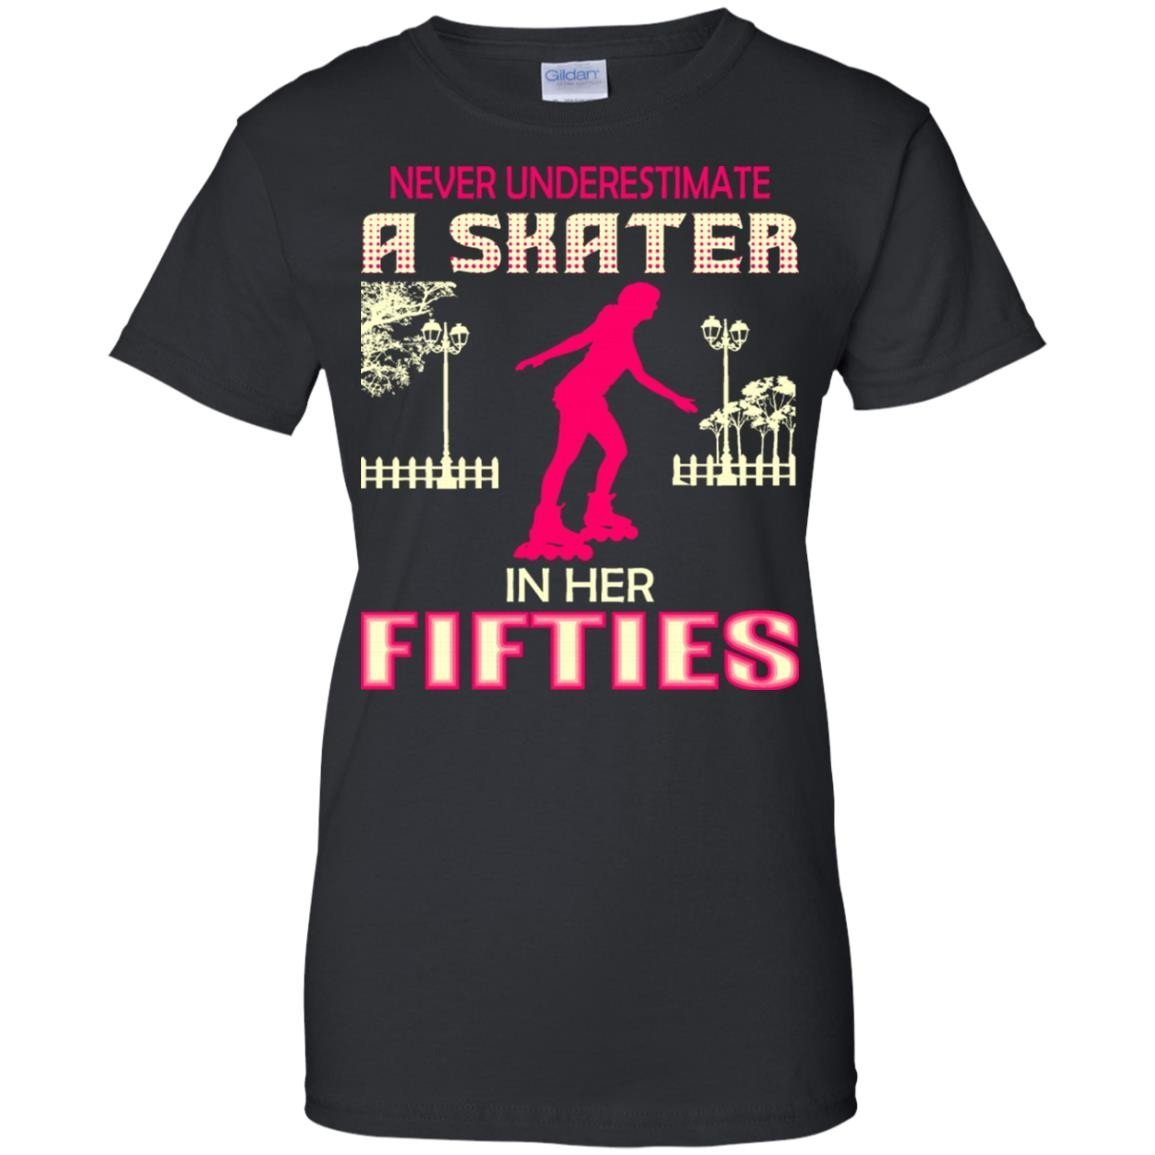 Never Underestimate A Skater In Her Fifties T-Shirt Women